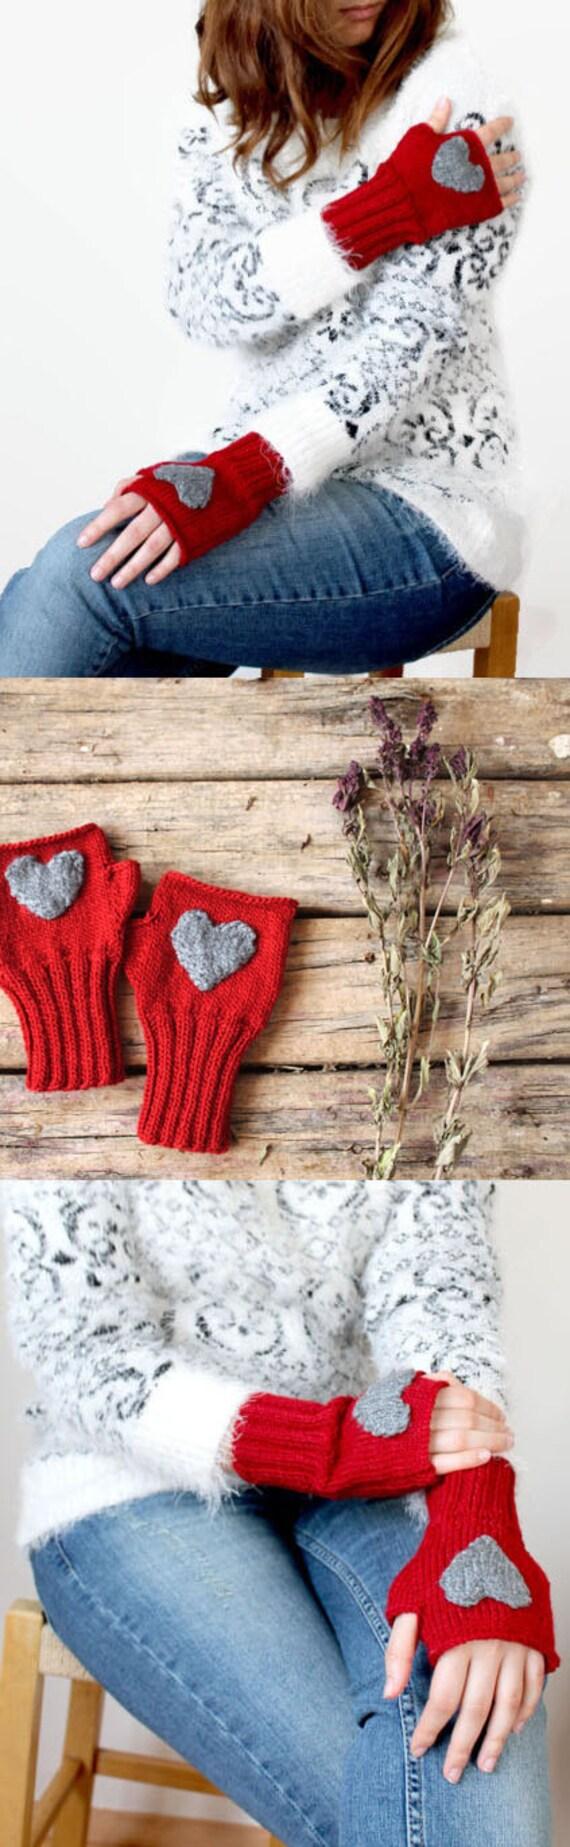 Heart Fingerless gloves . Knitting .  fashion . Girls , women . Valentines day . Love . Red . Winter accessoires .